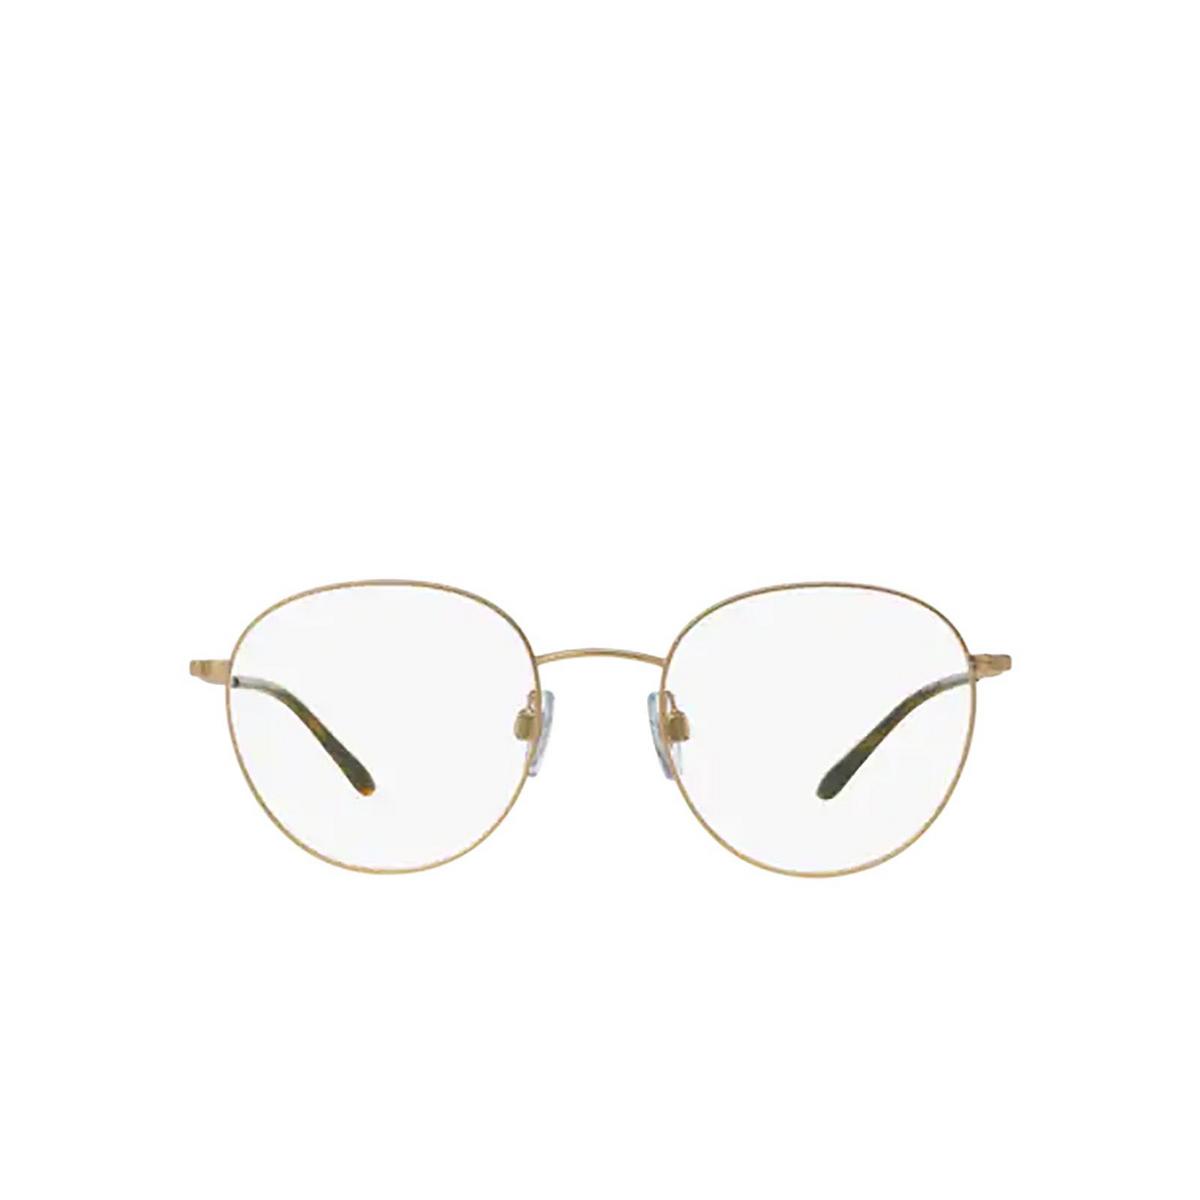 Giorgio Armani® Round Eyeglasses: AR5057 color Matte Pale Gold 3002 - front view.